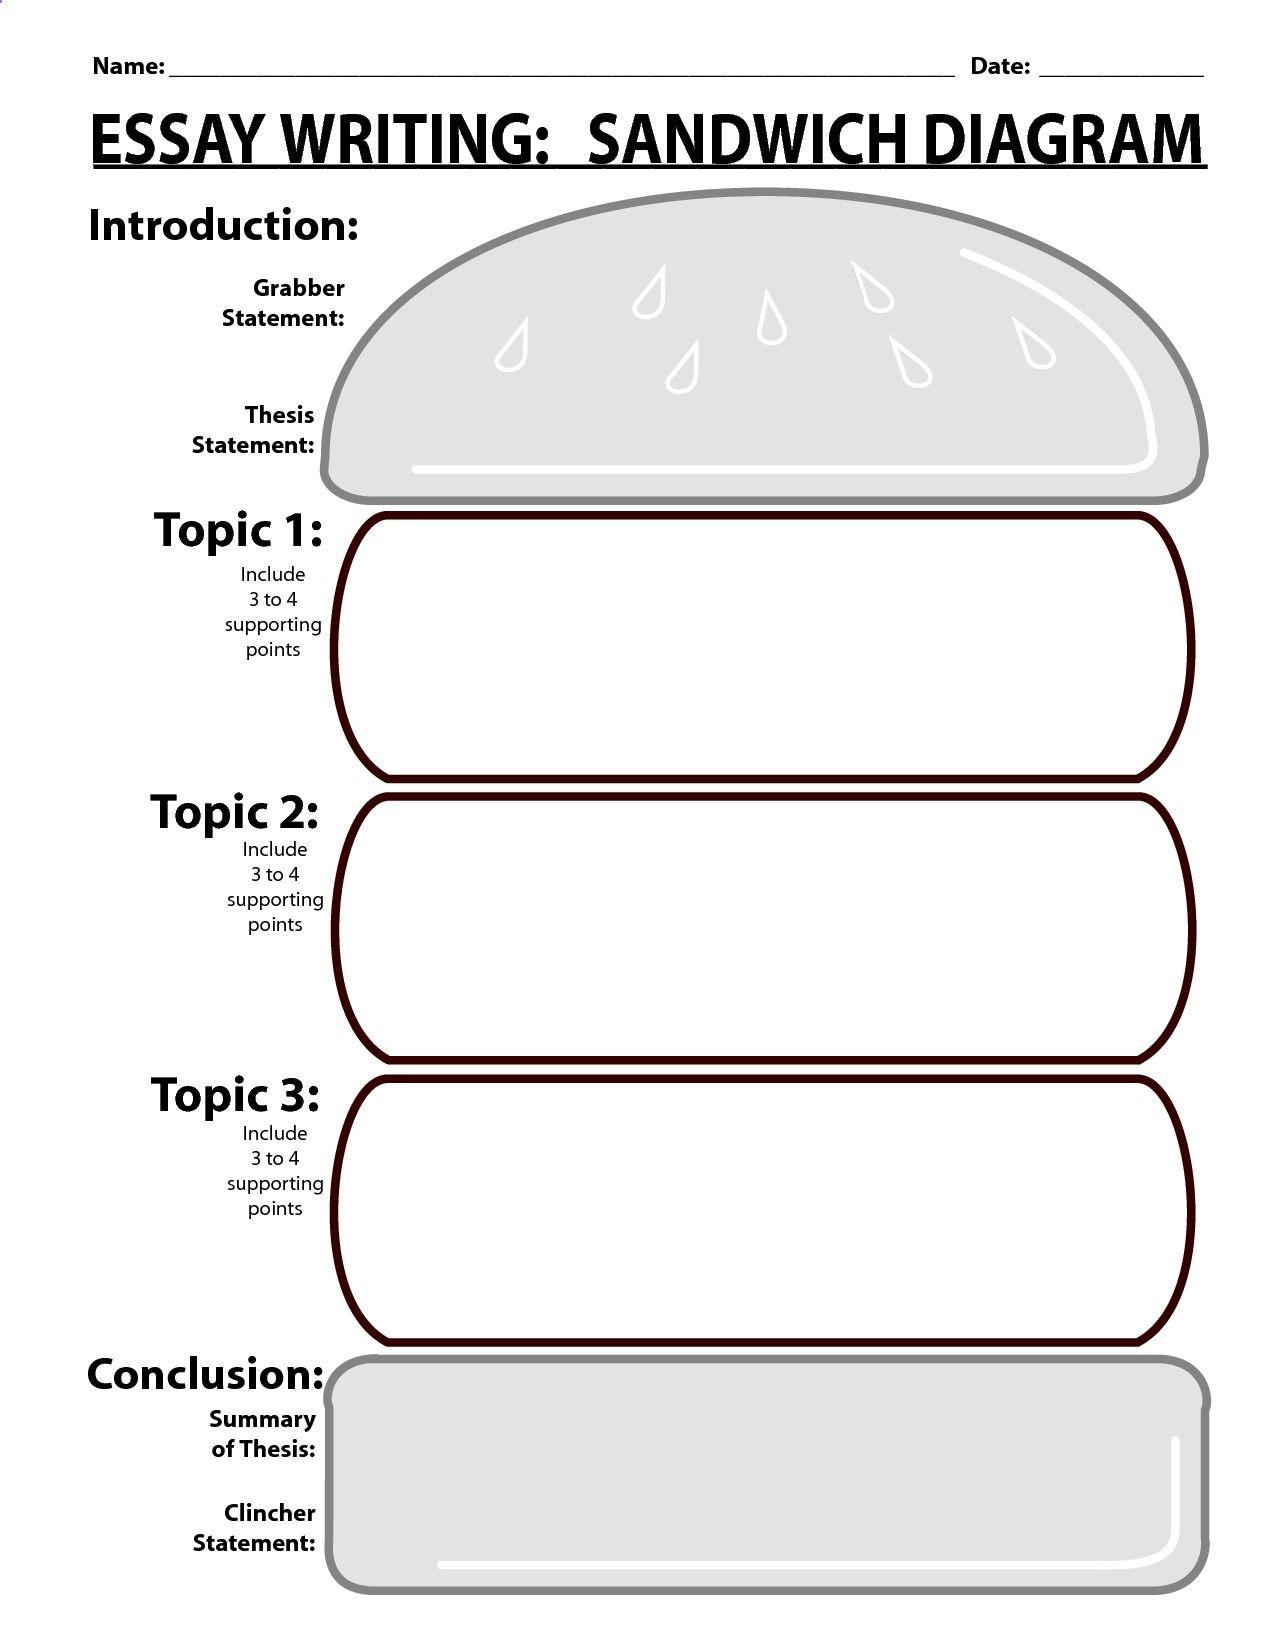 Writing Pdf Essay Writing Sandwich Diagram Download As Pdf Teaching Essay Writing Essay Writing Writing Templates